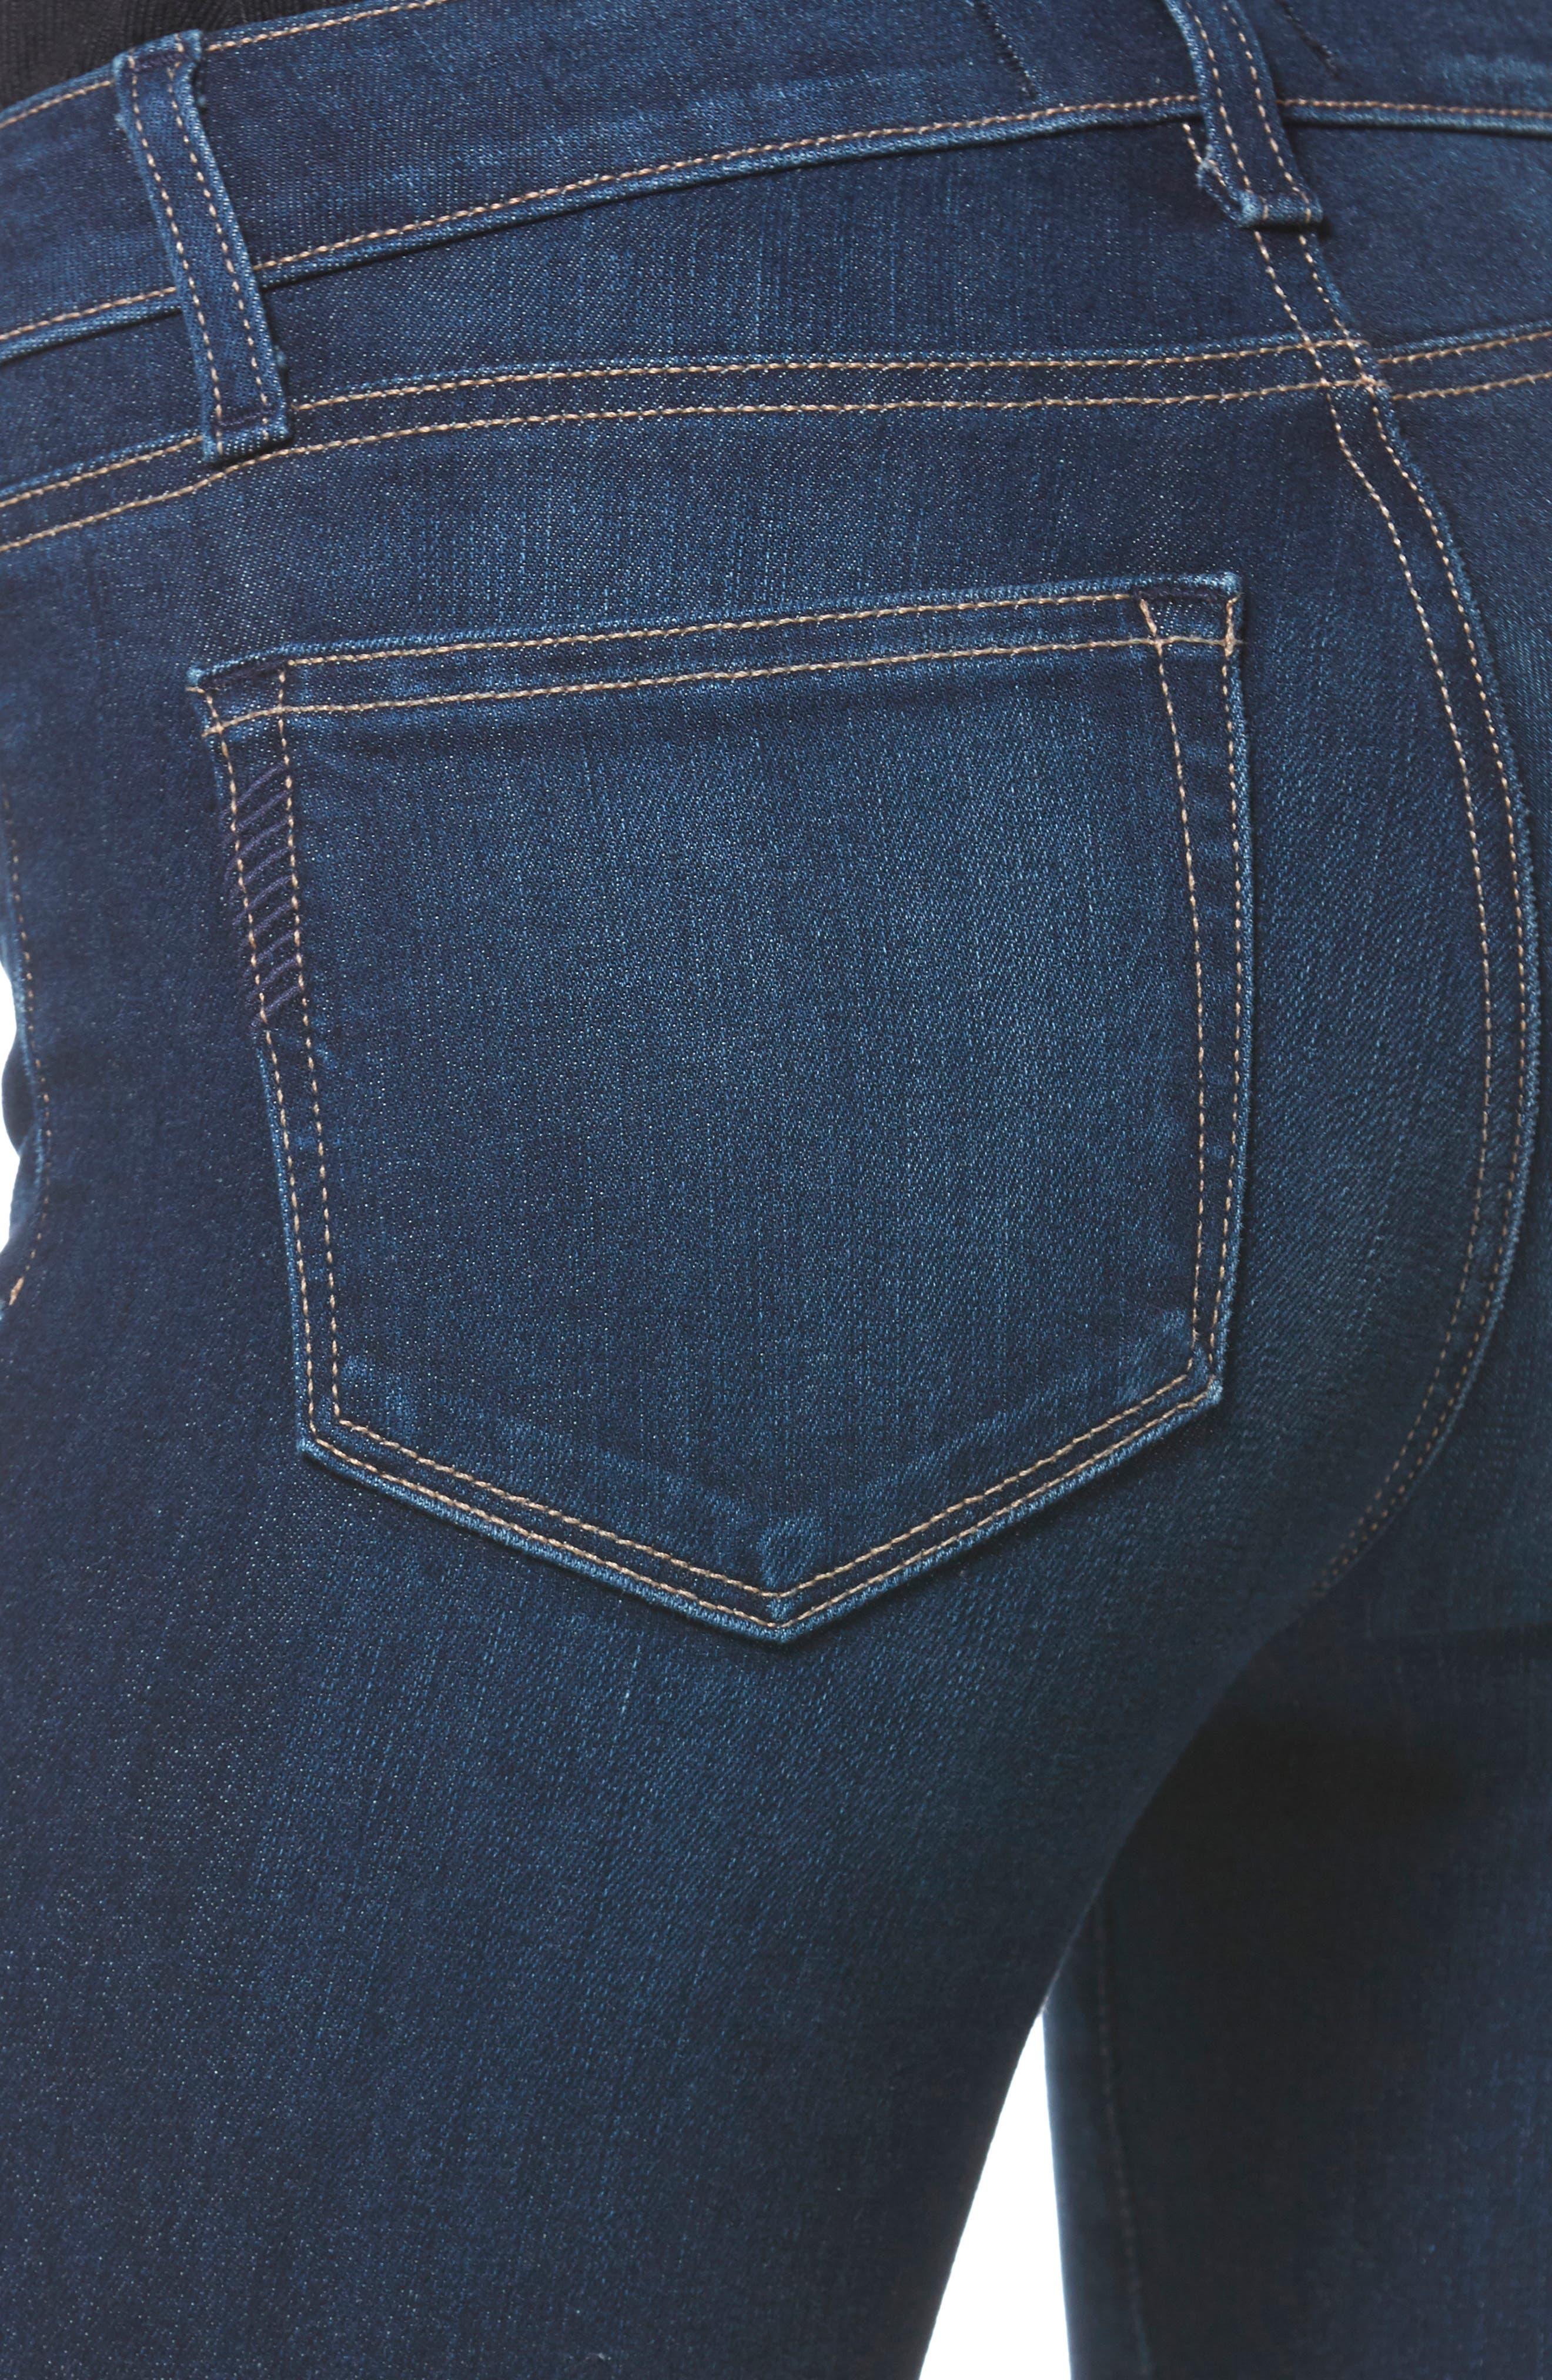 Skyline Skinny Jeans,                             Alternate thumbnail 4, color,                             IDLEWILD